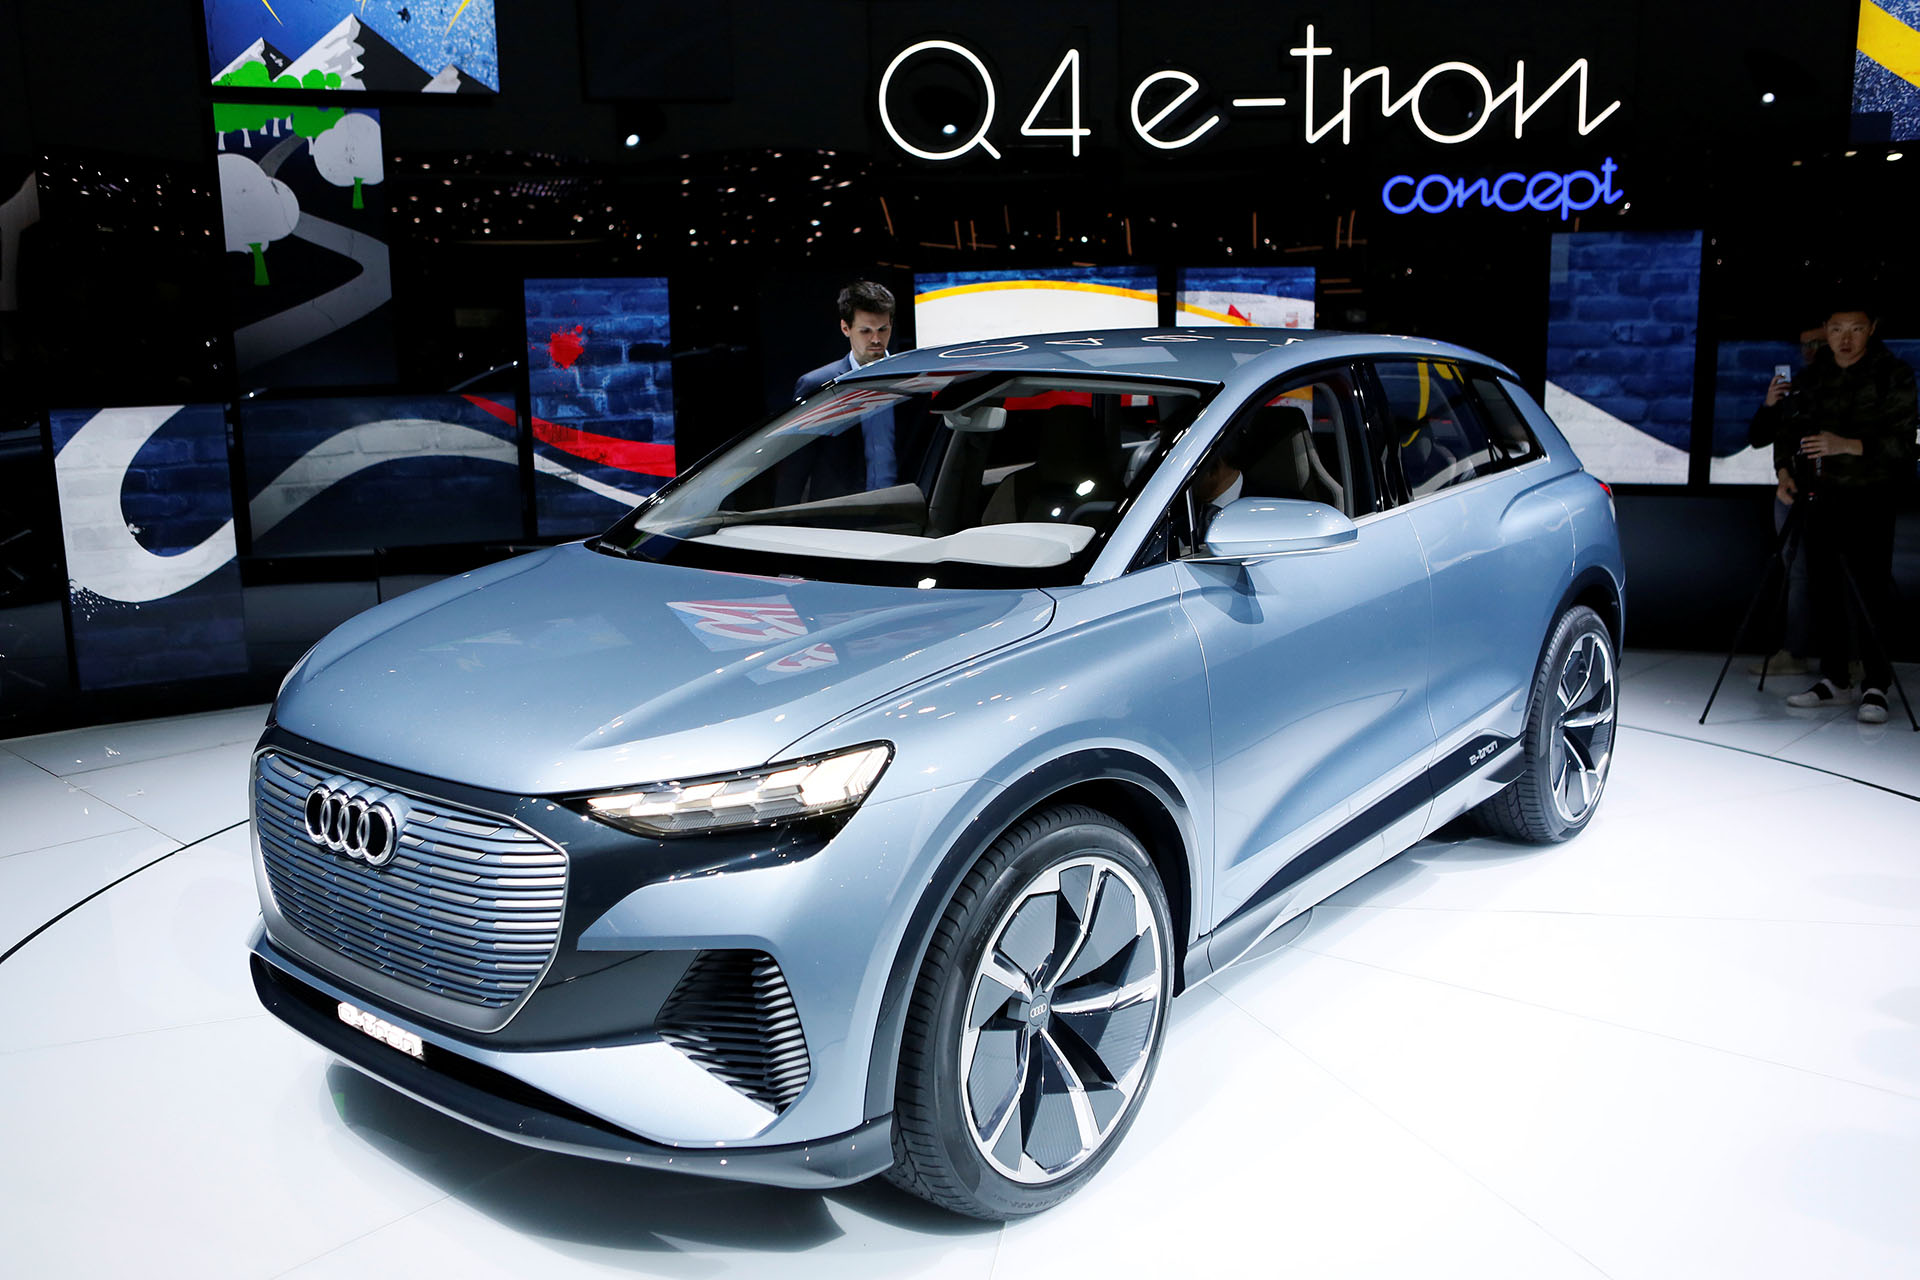 El Audi Q4 E-Tron Concept es el quinto automóvil eléctrico de Audi, unSUV con 450 km de autonomía